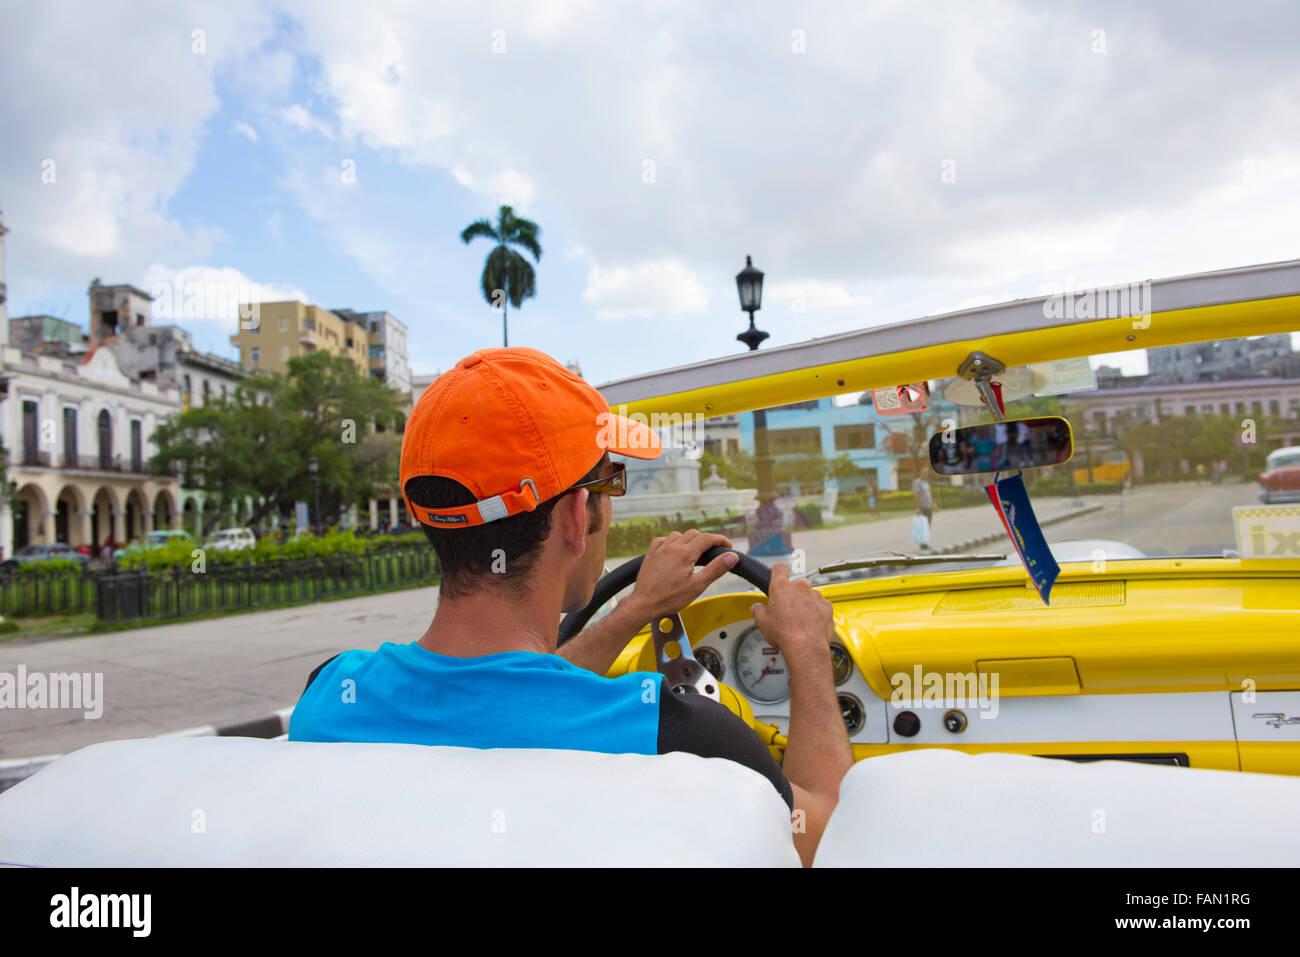 Mann fahren alte klassische Oldtimer, Taxifahrer in Havanna, La Habana, Kuba Stockbild